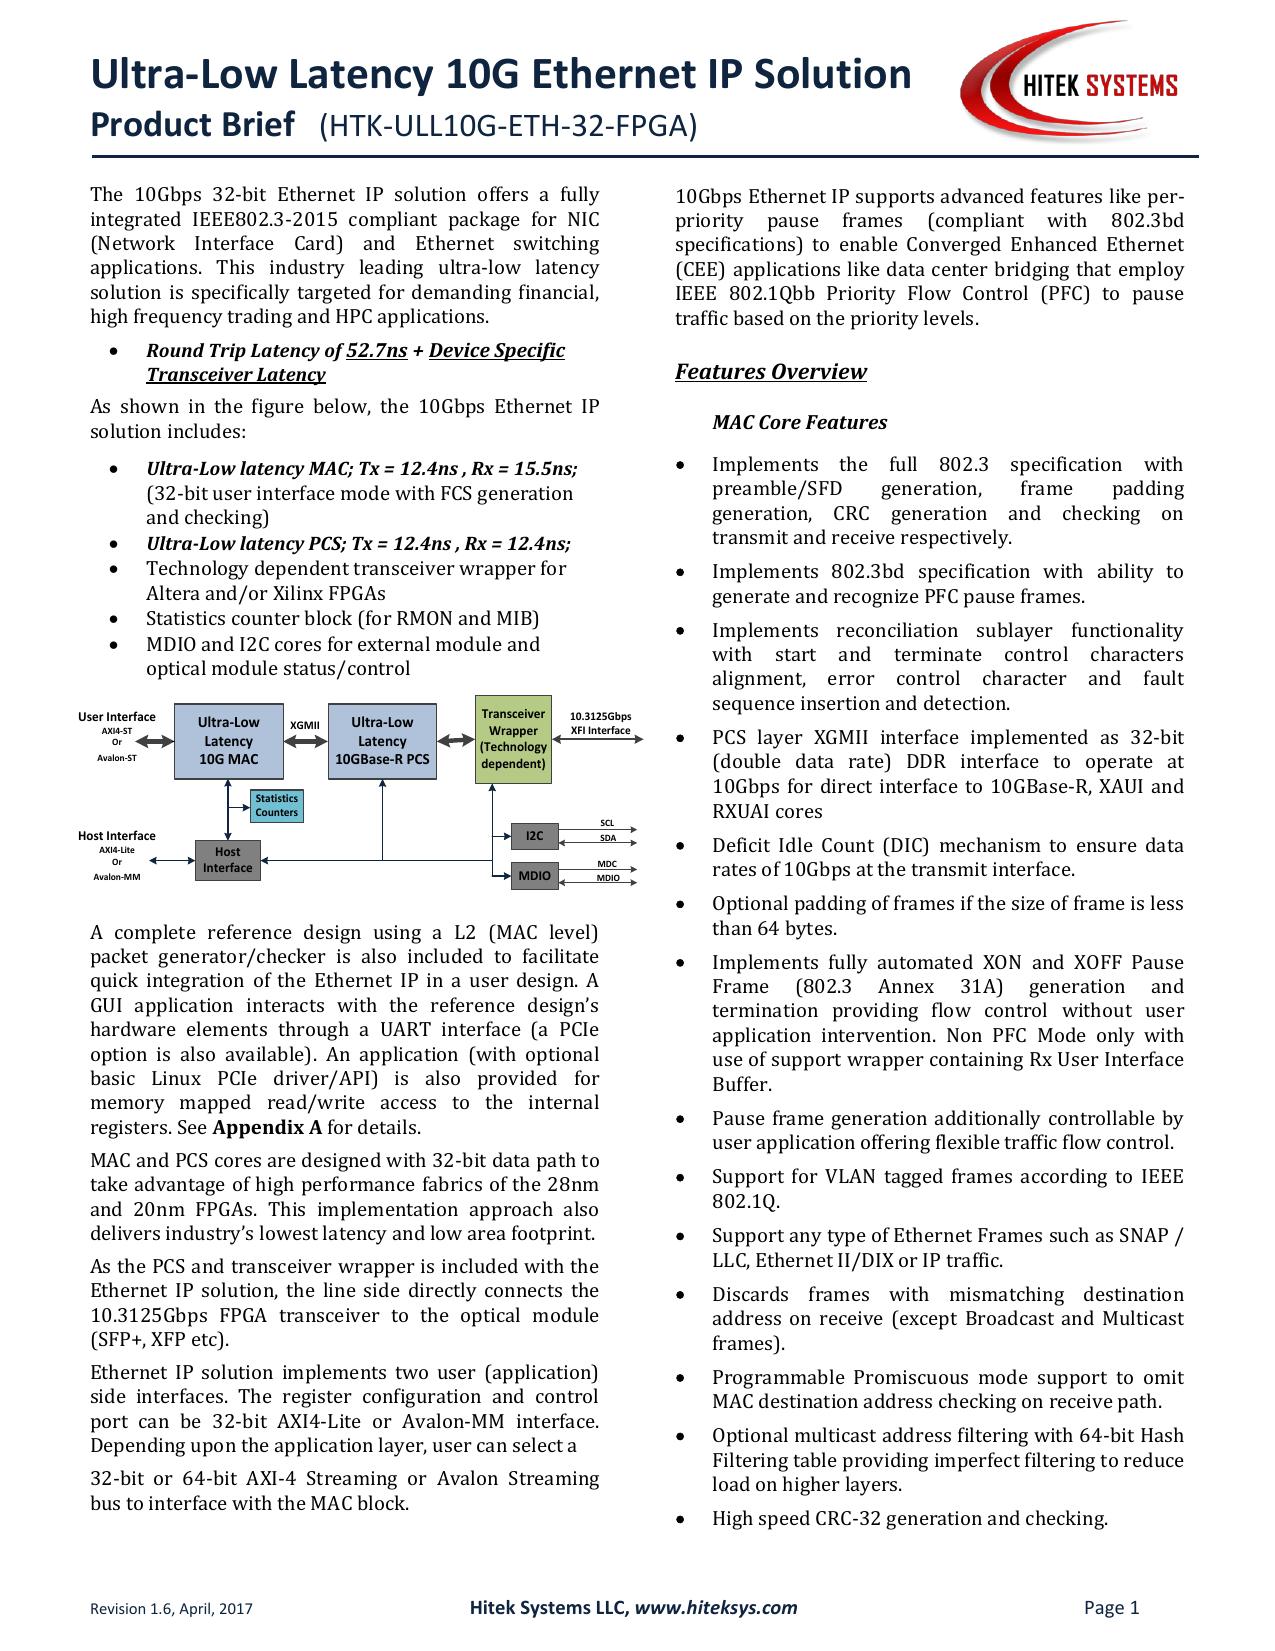 Ultra-Low Latency 10G Ethernet IP Solution | manualzz com